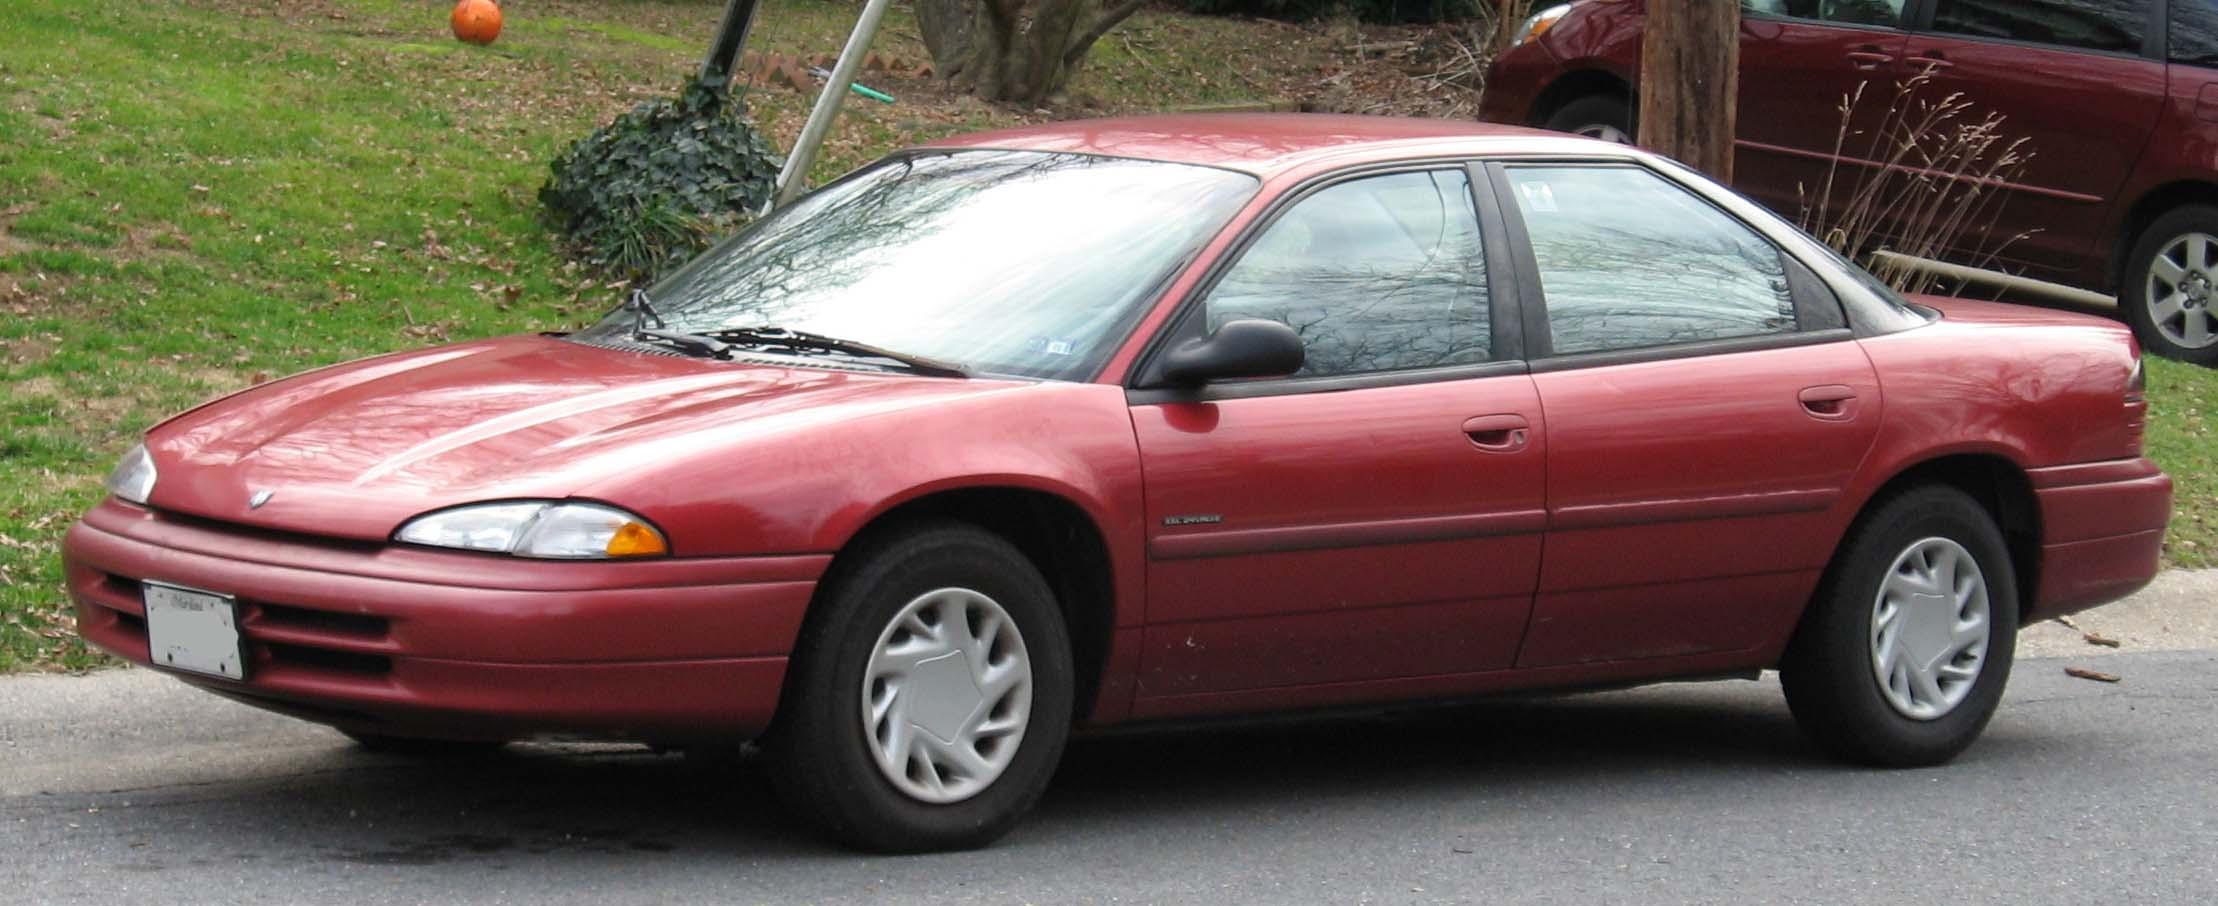 Dodge-Intrepid: intrepid problems ; Automotive.